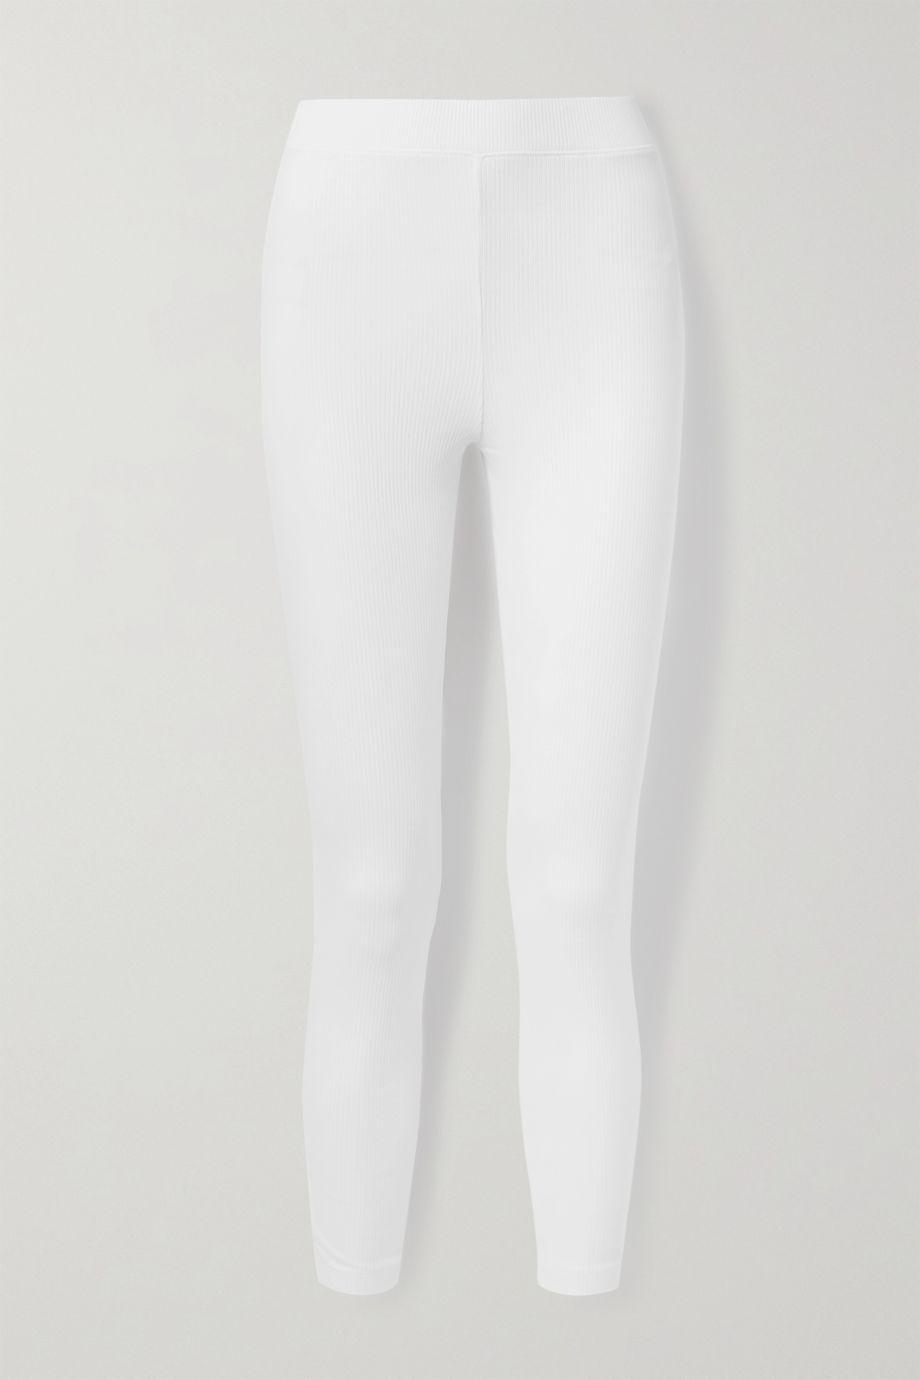 Skin Ilanit ribbed stretch-Pima cotton-jersey leggings